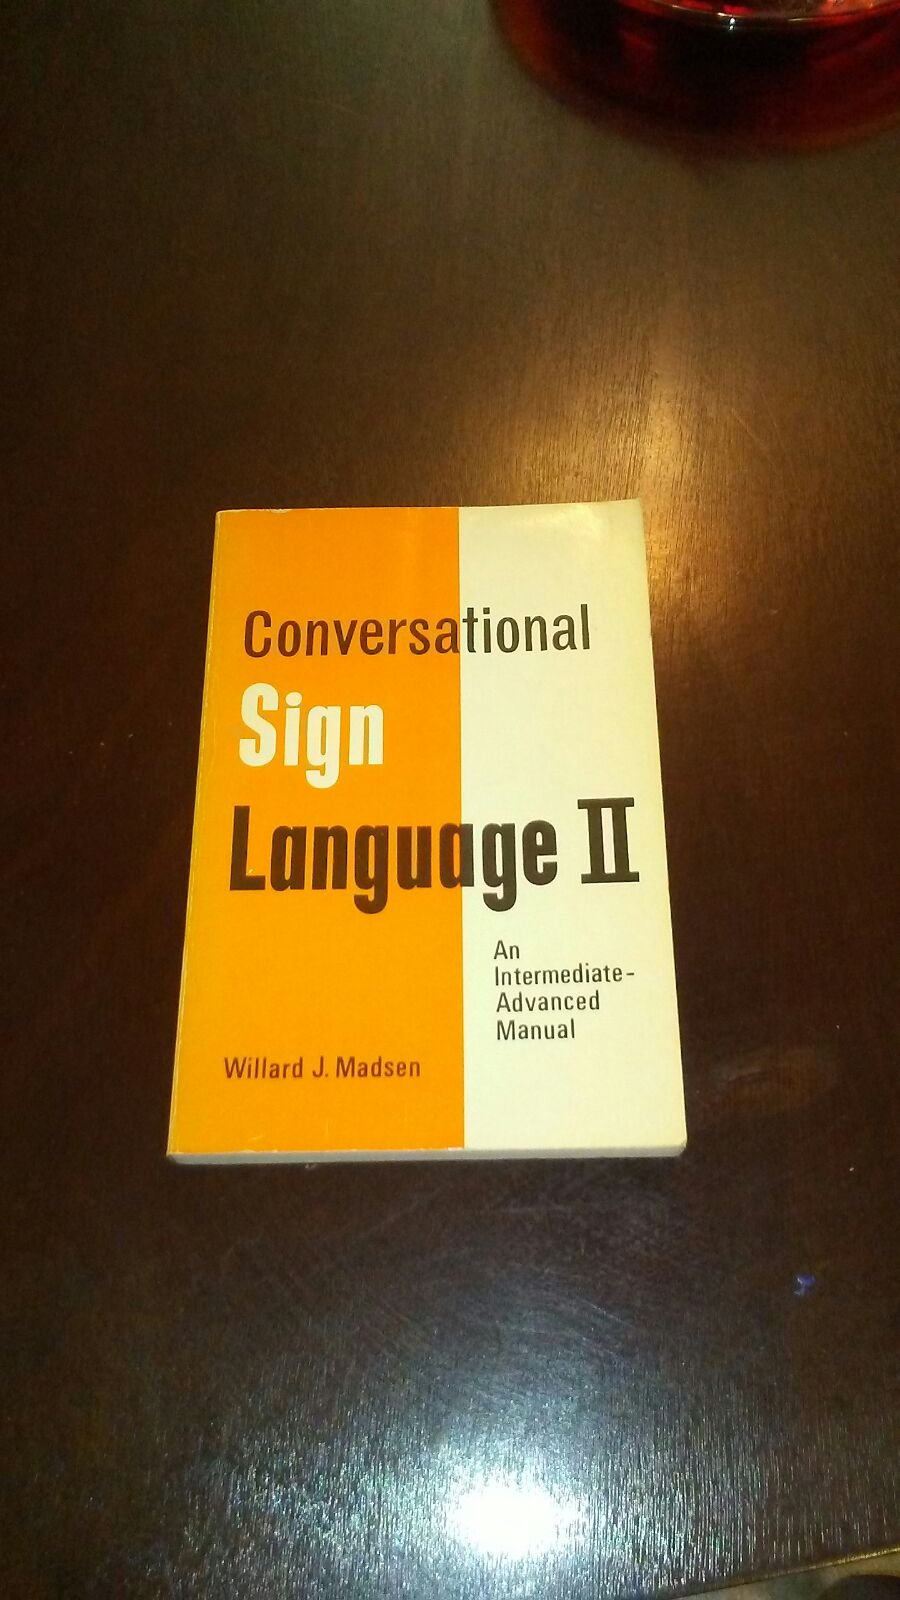 Vintage conversational sign language II